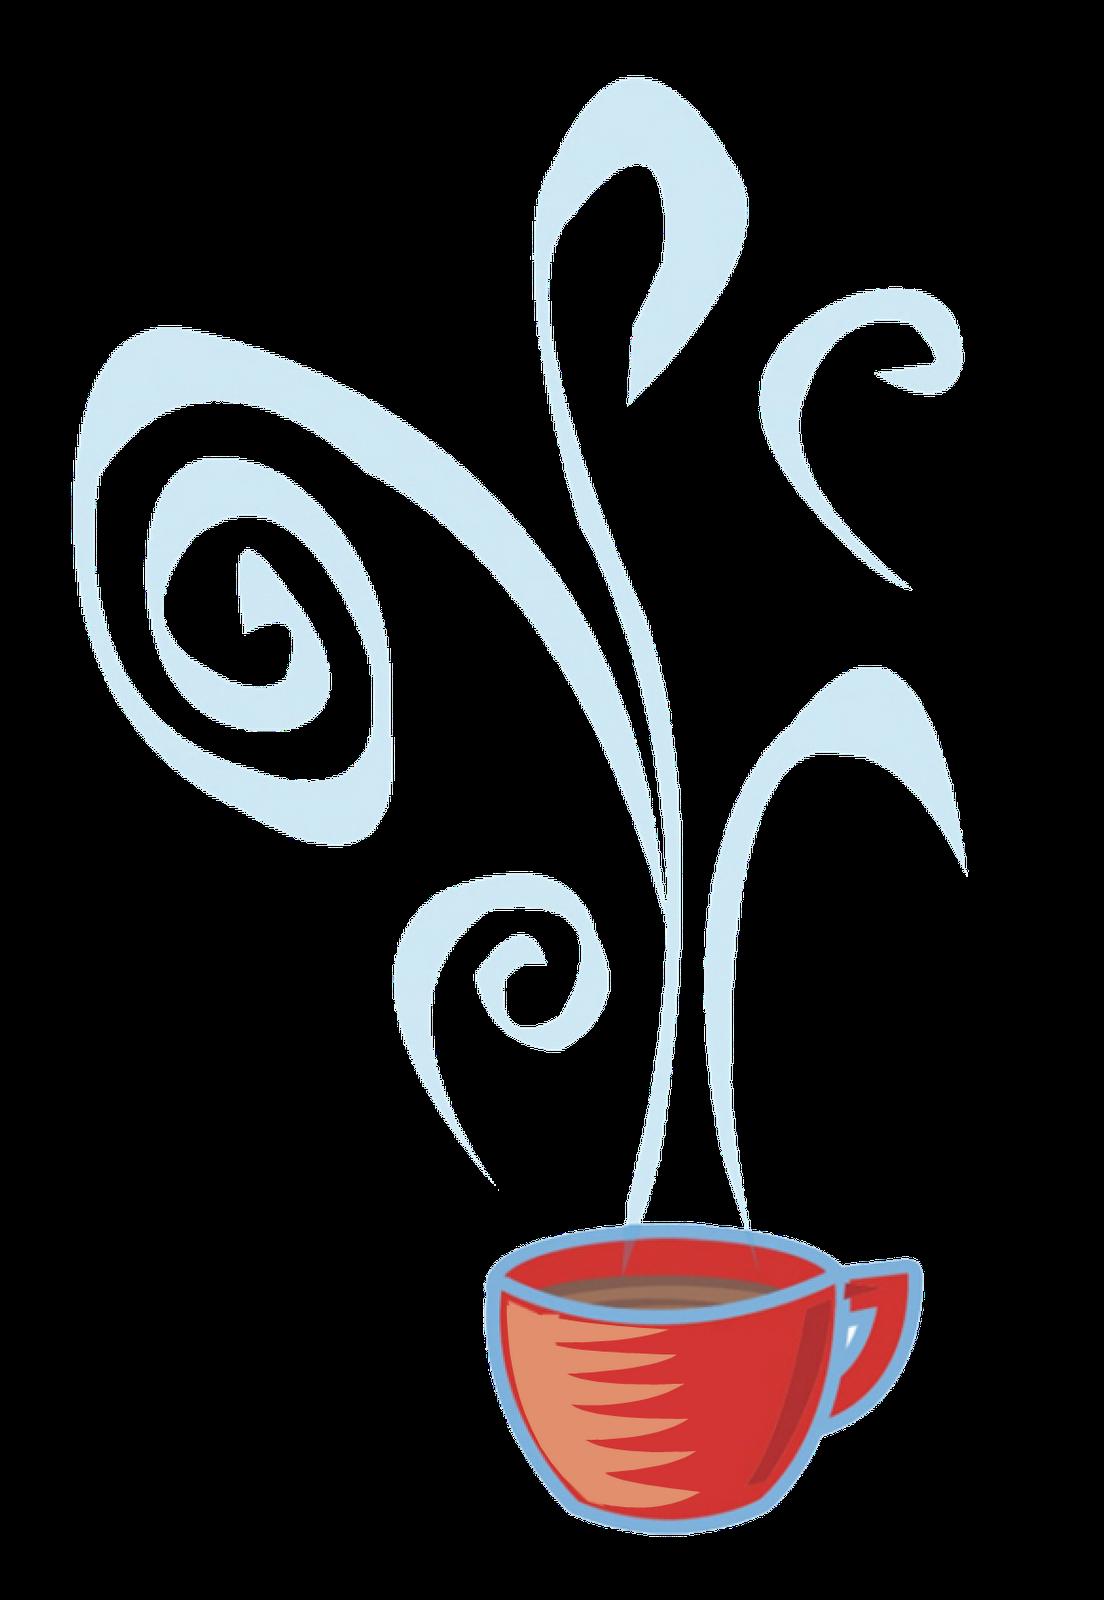 Hot Chocolate clipart steam #1